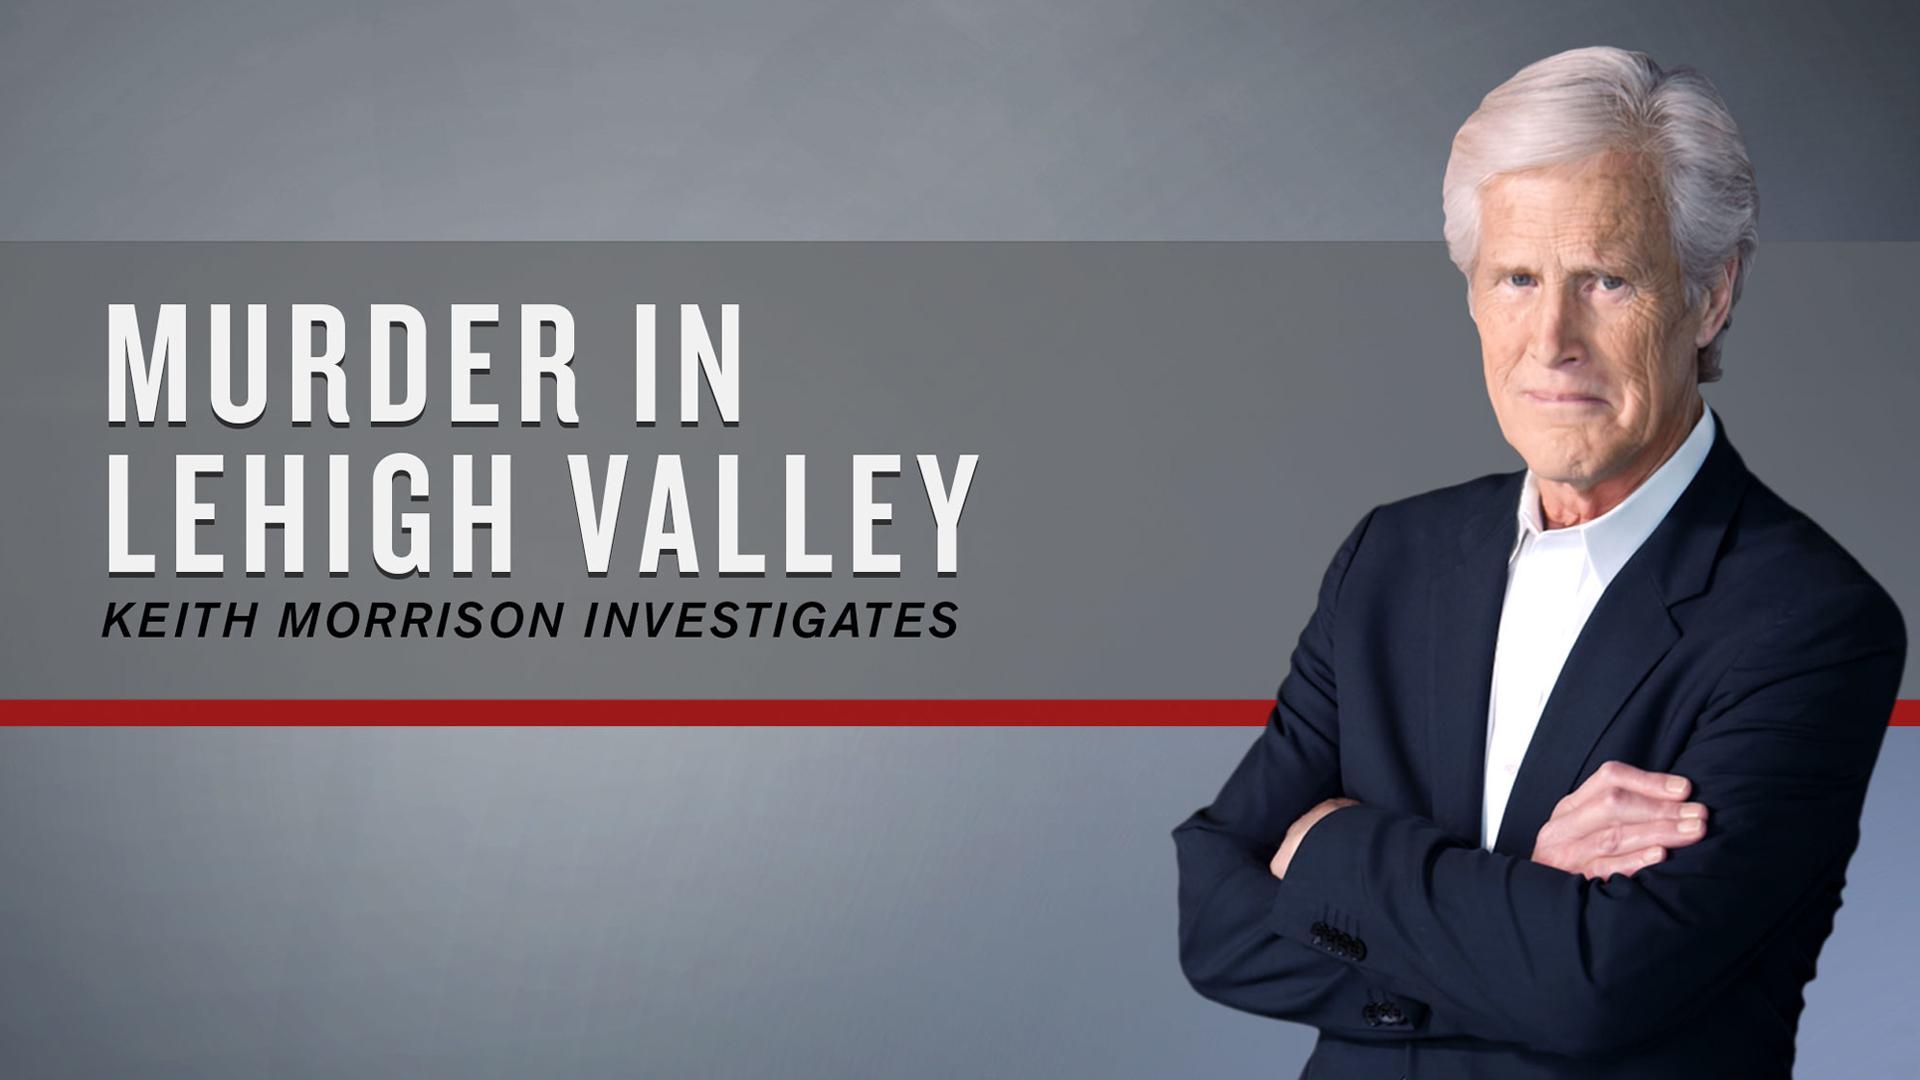 Murder in Lehigh Valley Keith Morrison Investigates Season 1